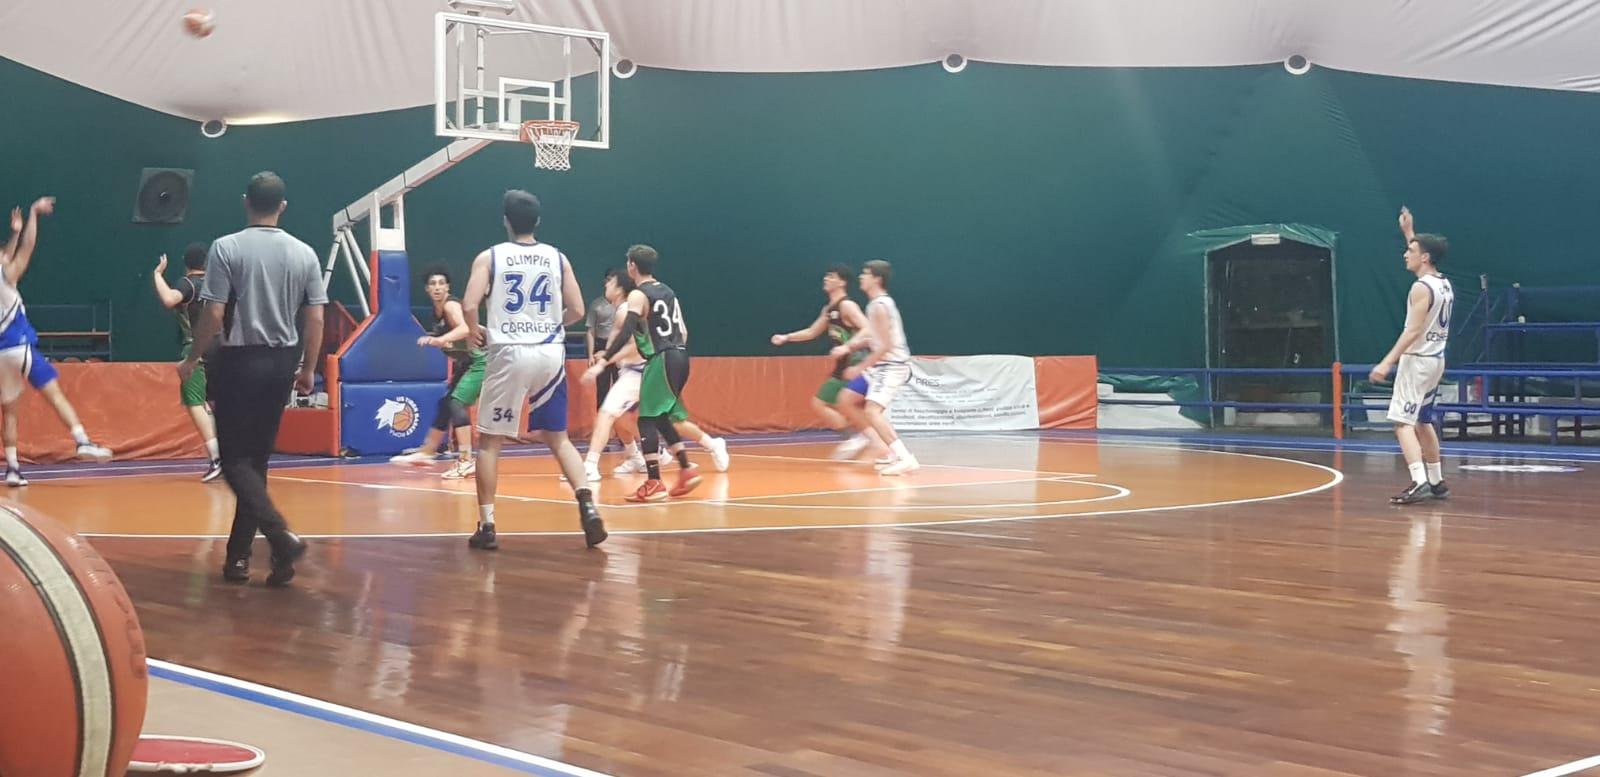 U18 E  Olimpia Roma - Pallacanestro Palestrina   66 - 55 1